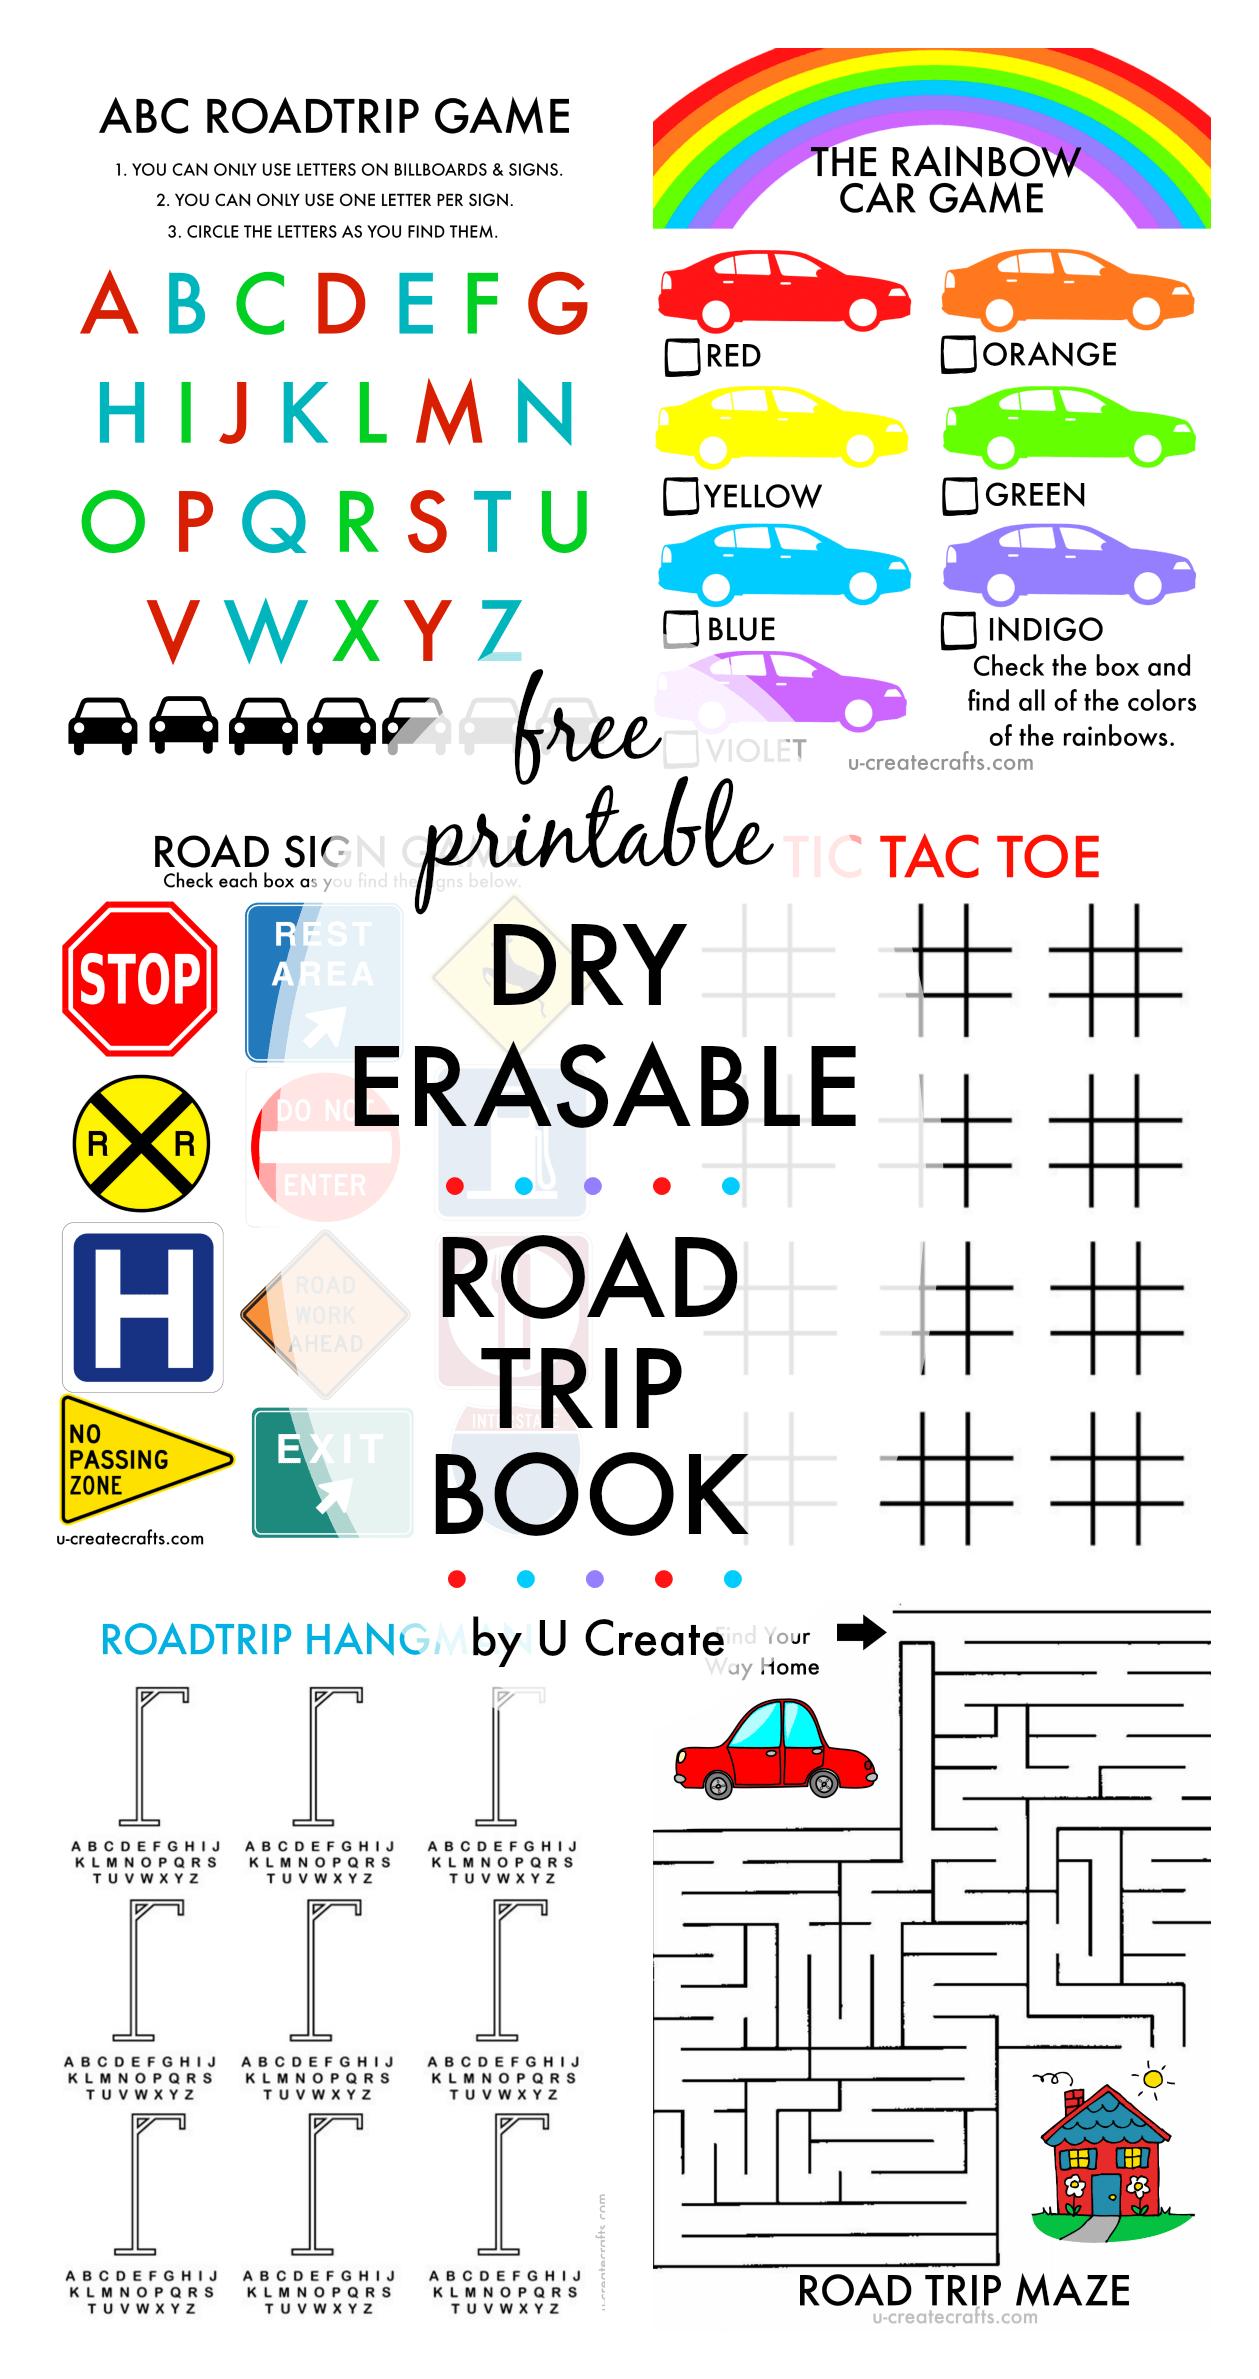 Free Printable Dry Erasable Road Trip Book For Kids